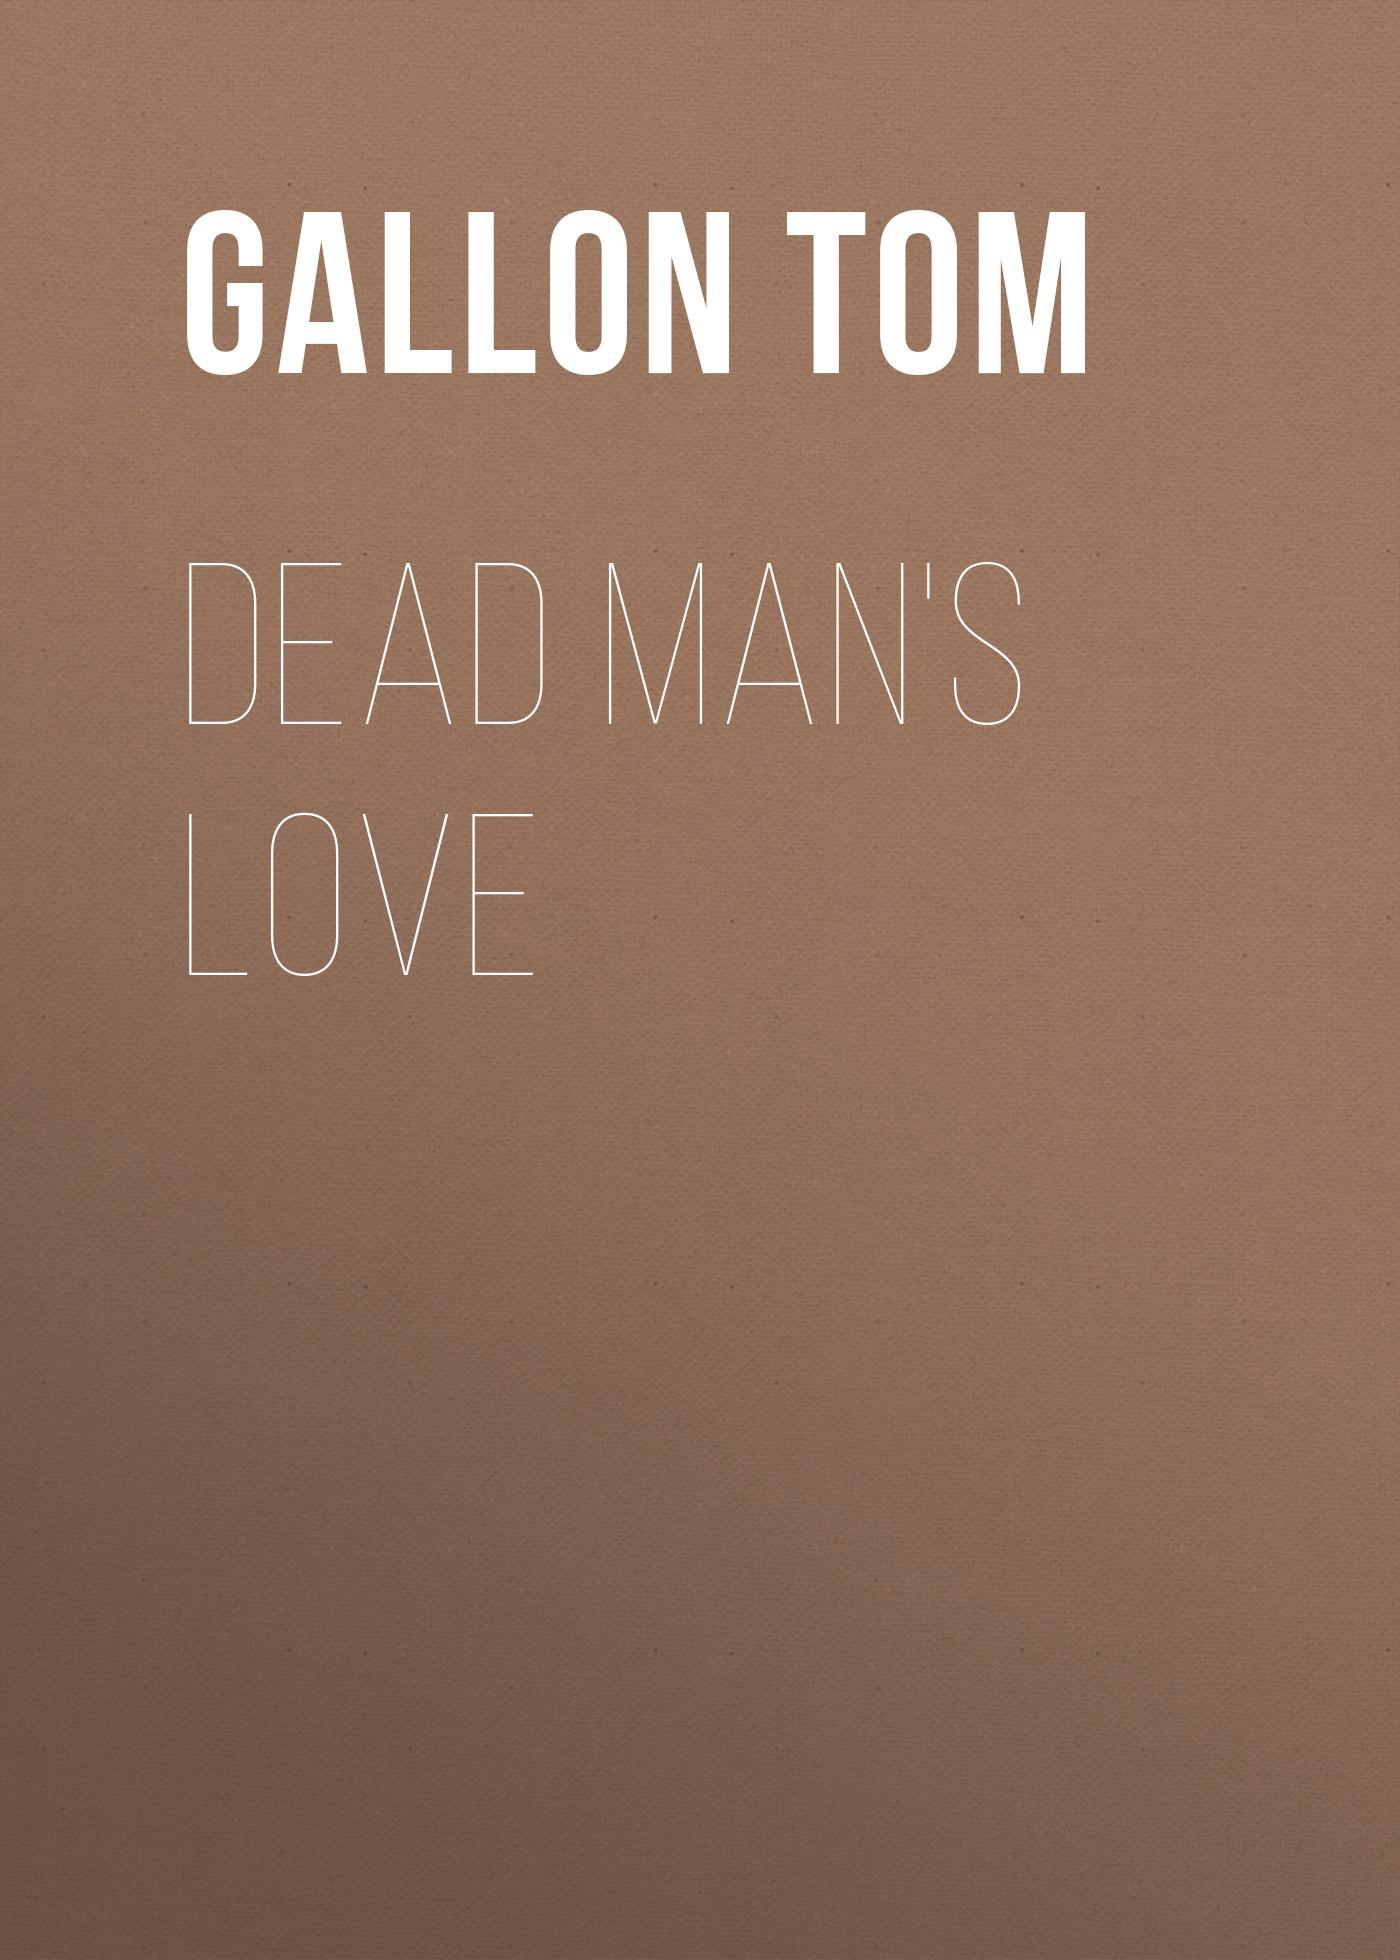 Gallon Tom Dead Man's Love vacuum 5 gallon bucket